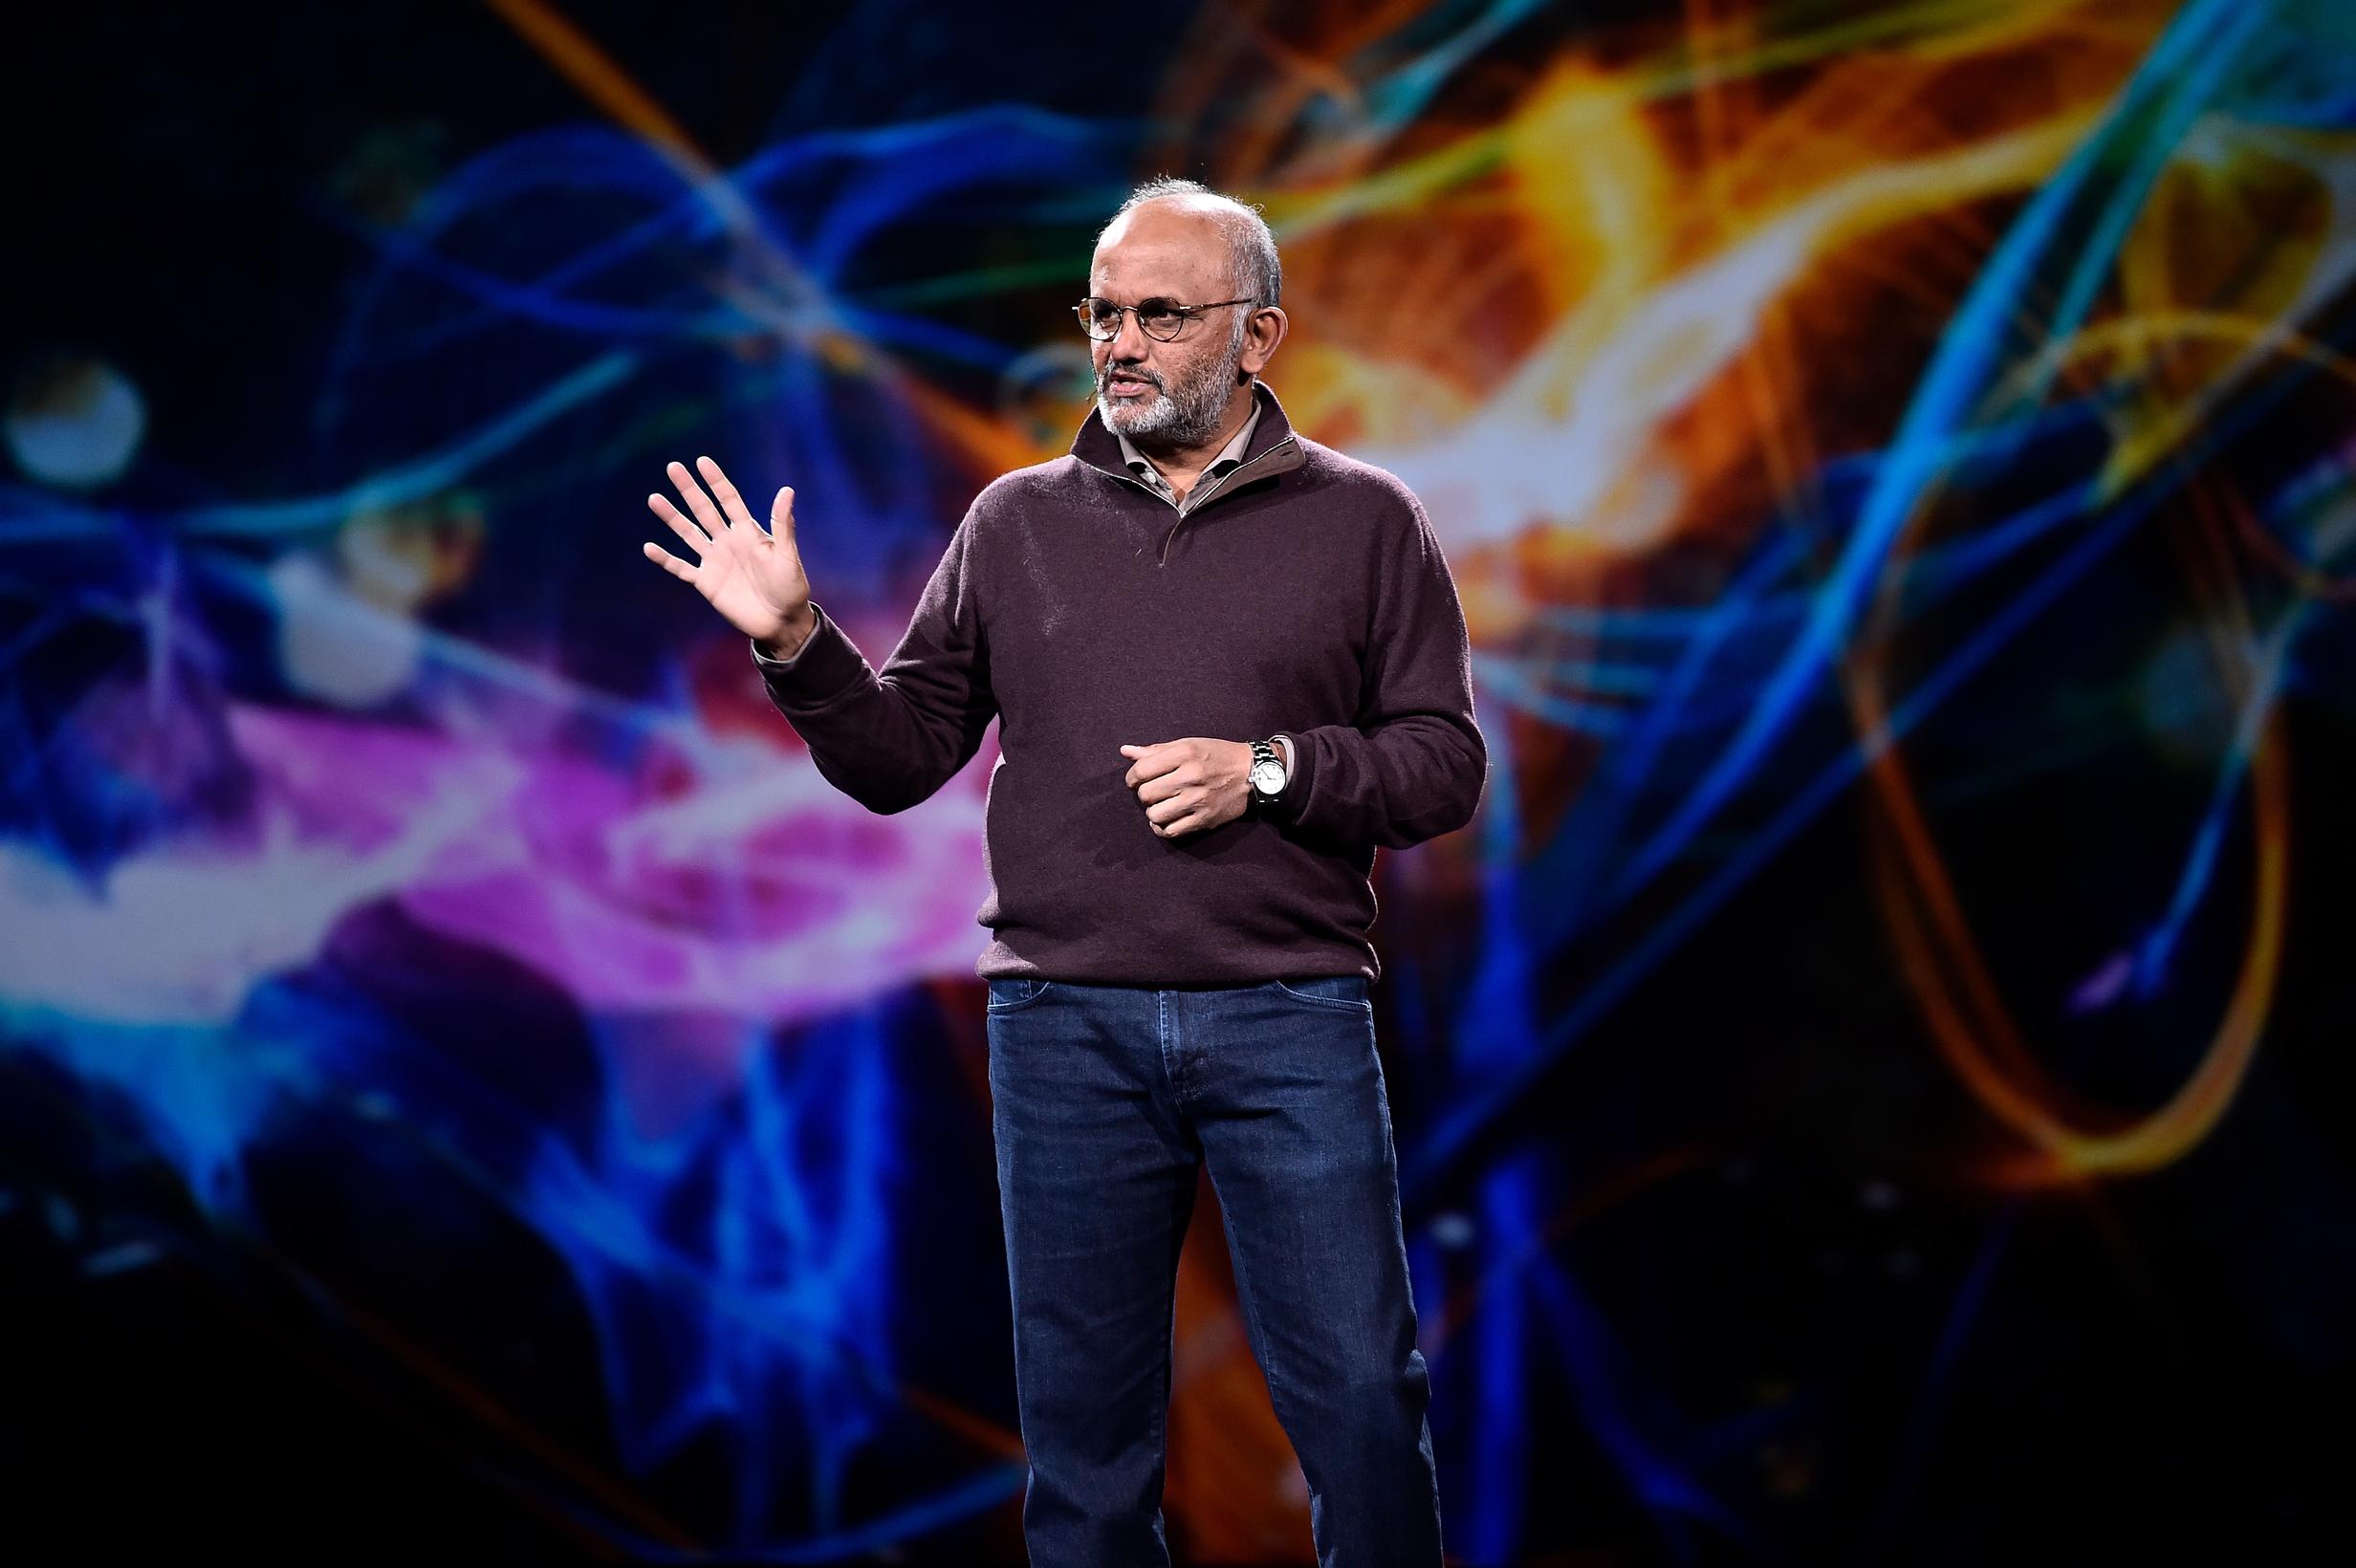 Adobe CEO Shantanu Narayen at Adobe Summit 2018.